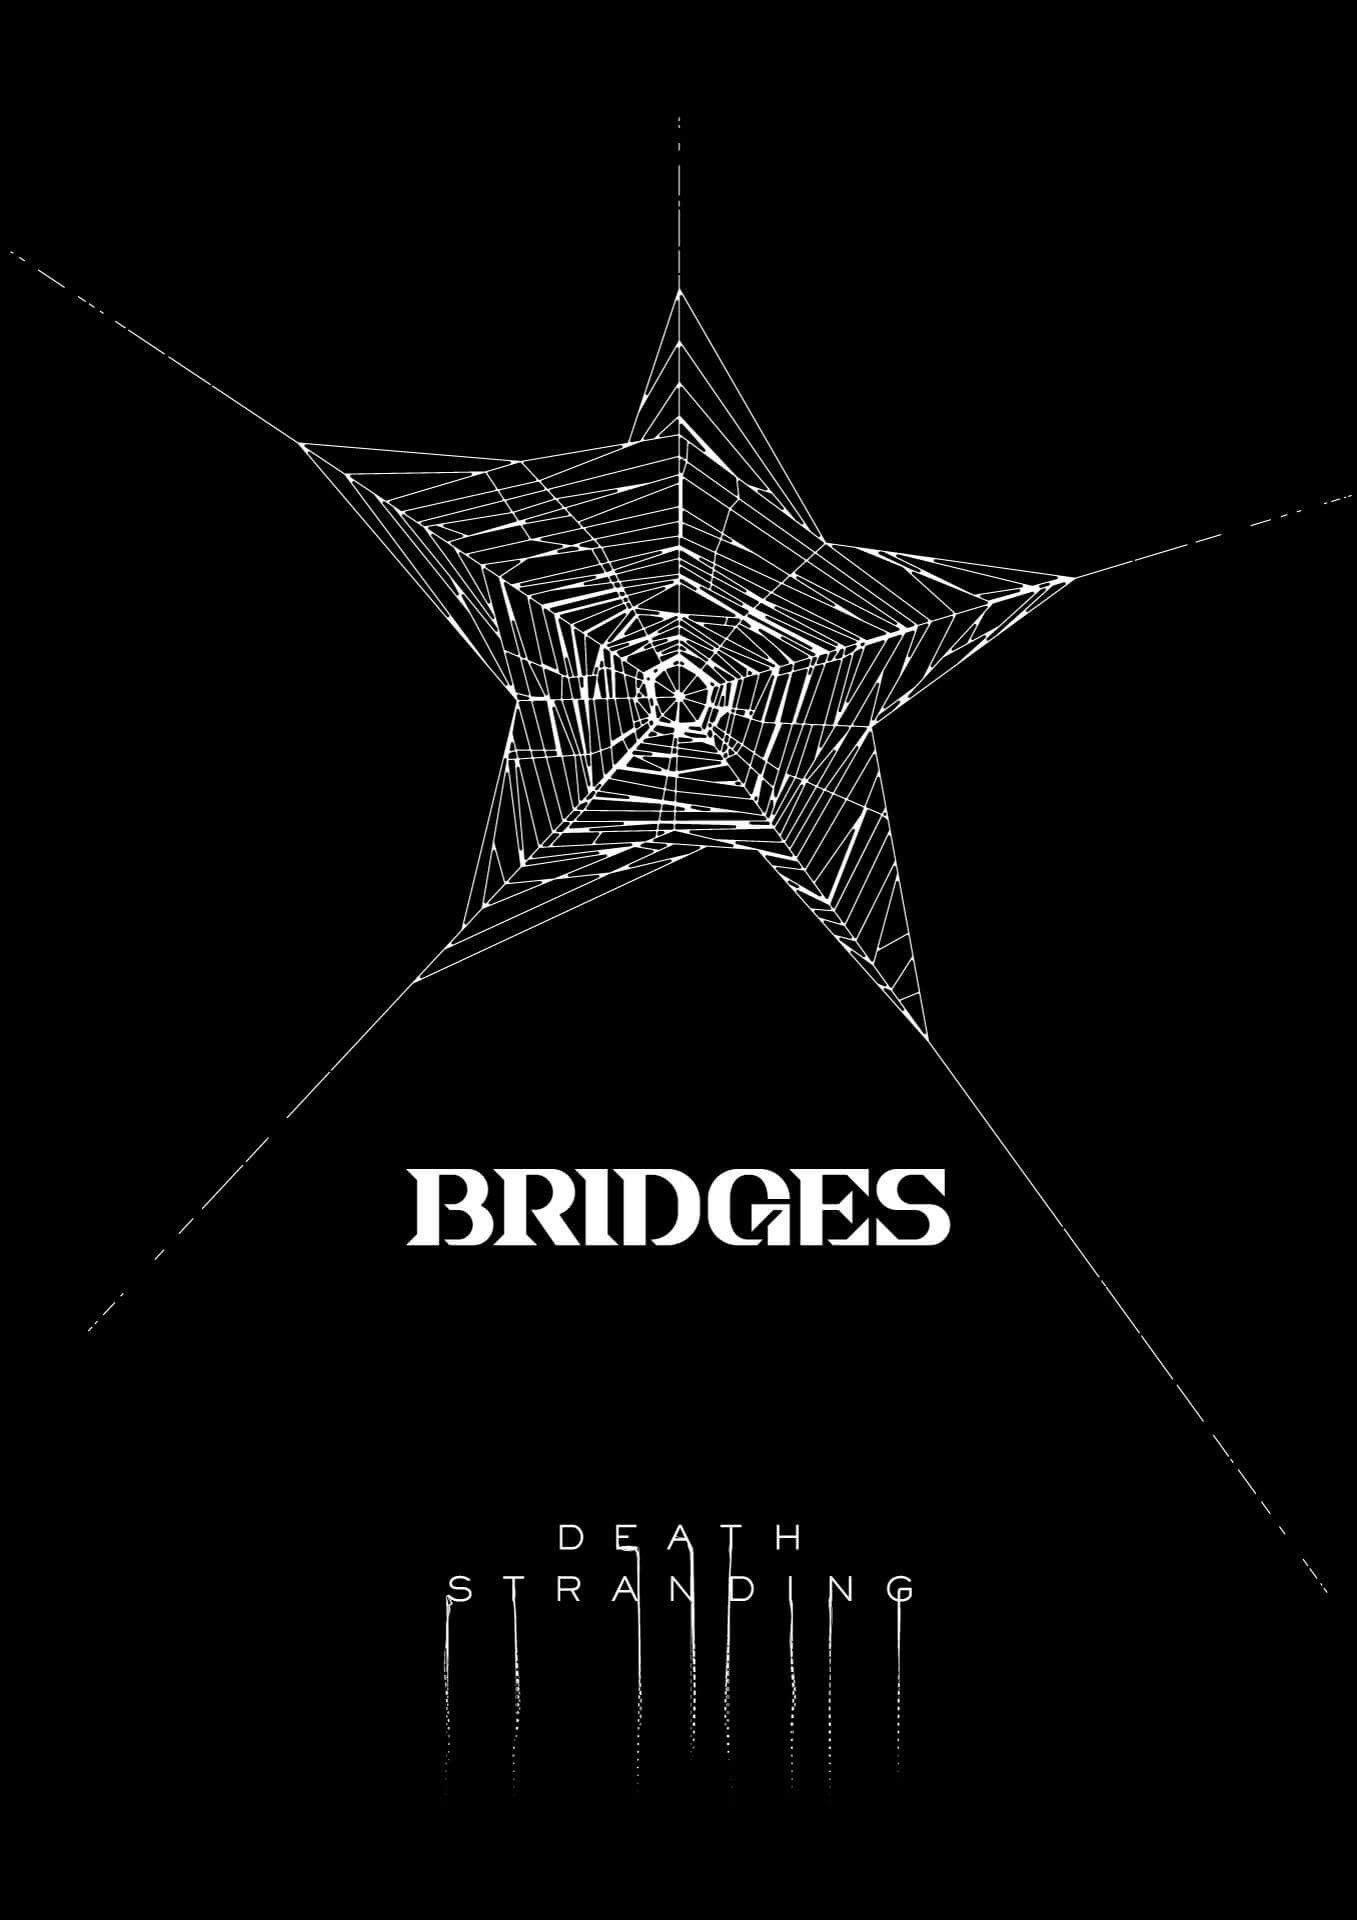 [Image: Death-Stranding-Bridges.jpg]